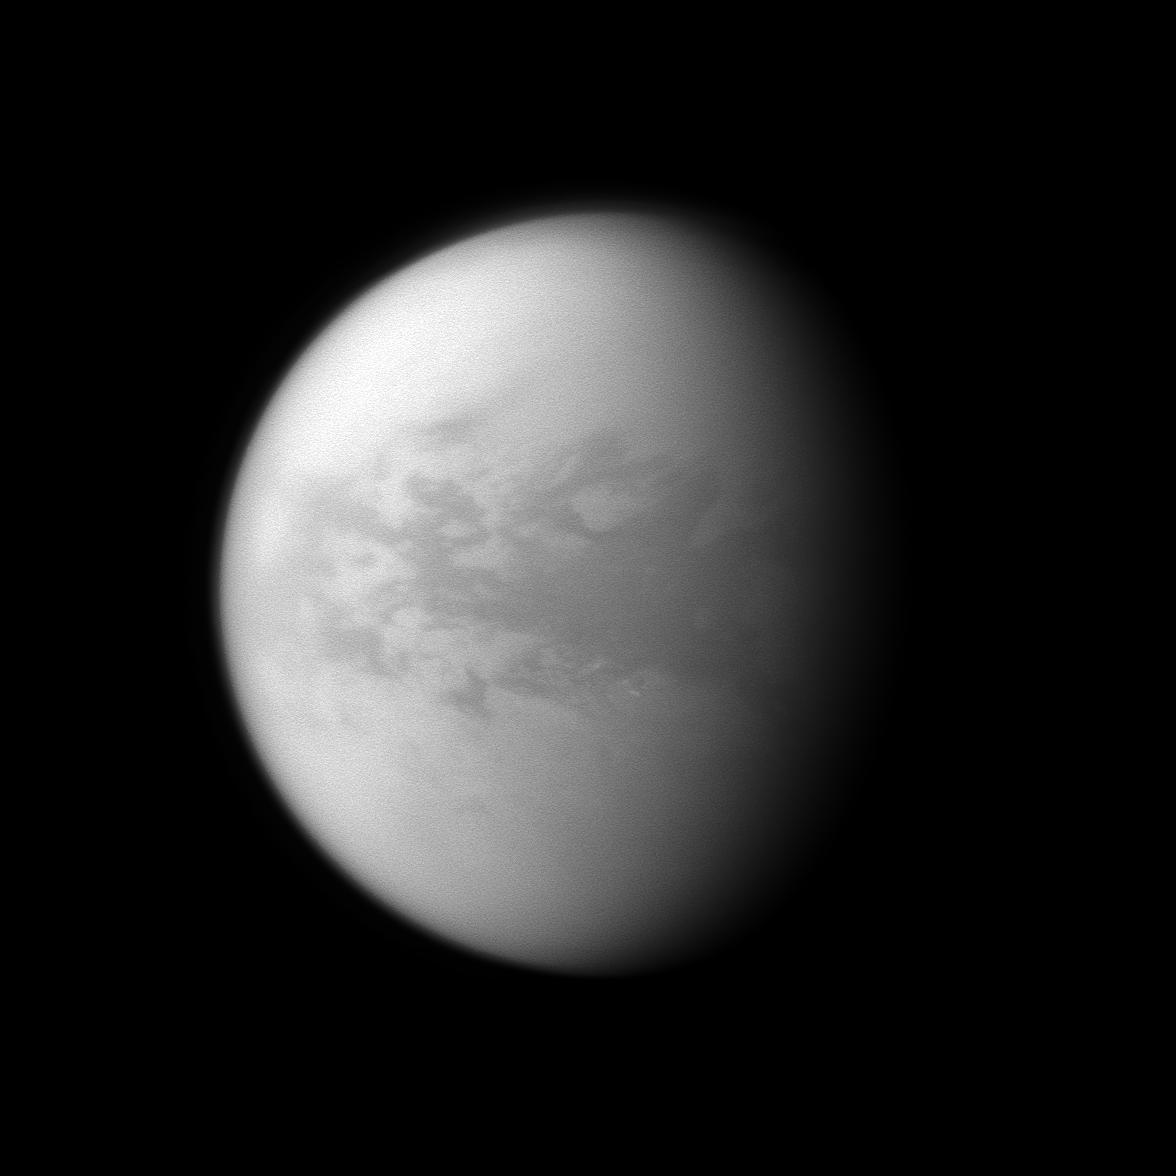 hy saturns moon titan - HD1024×1024